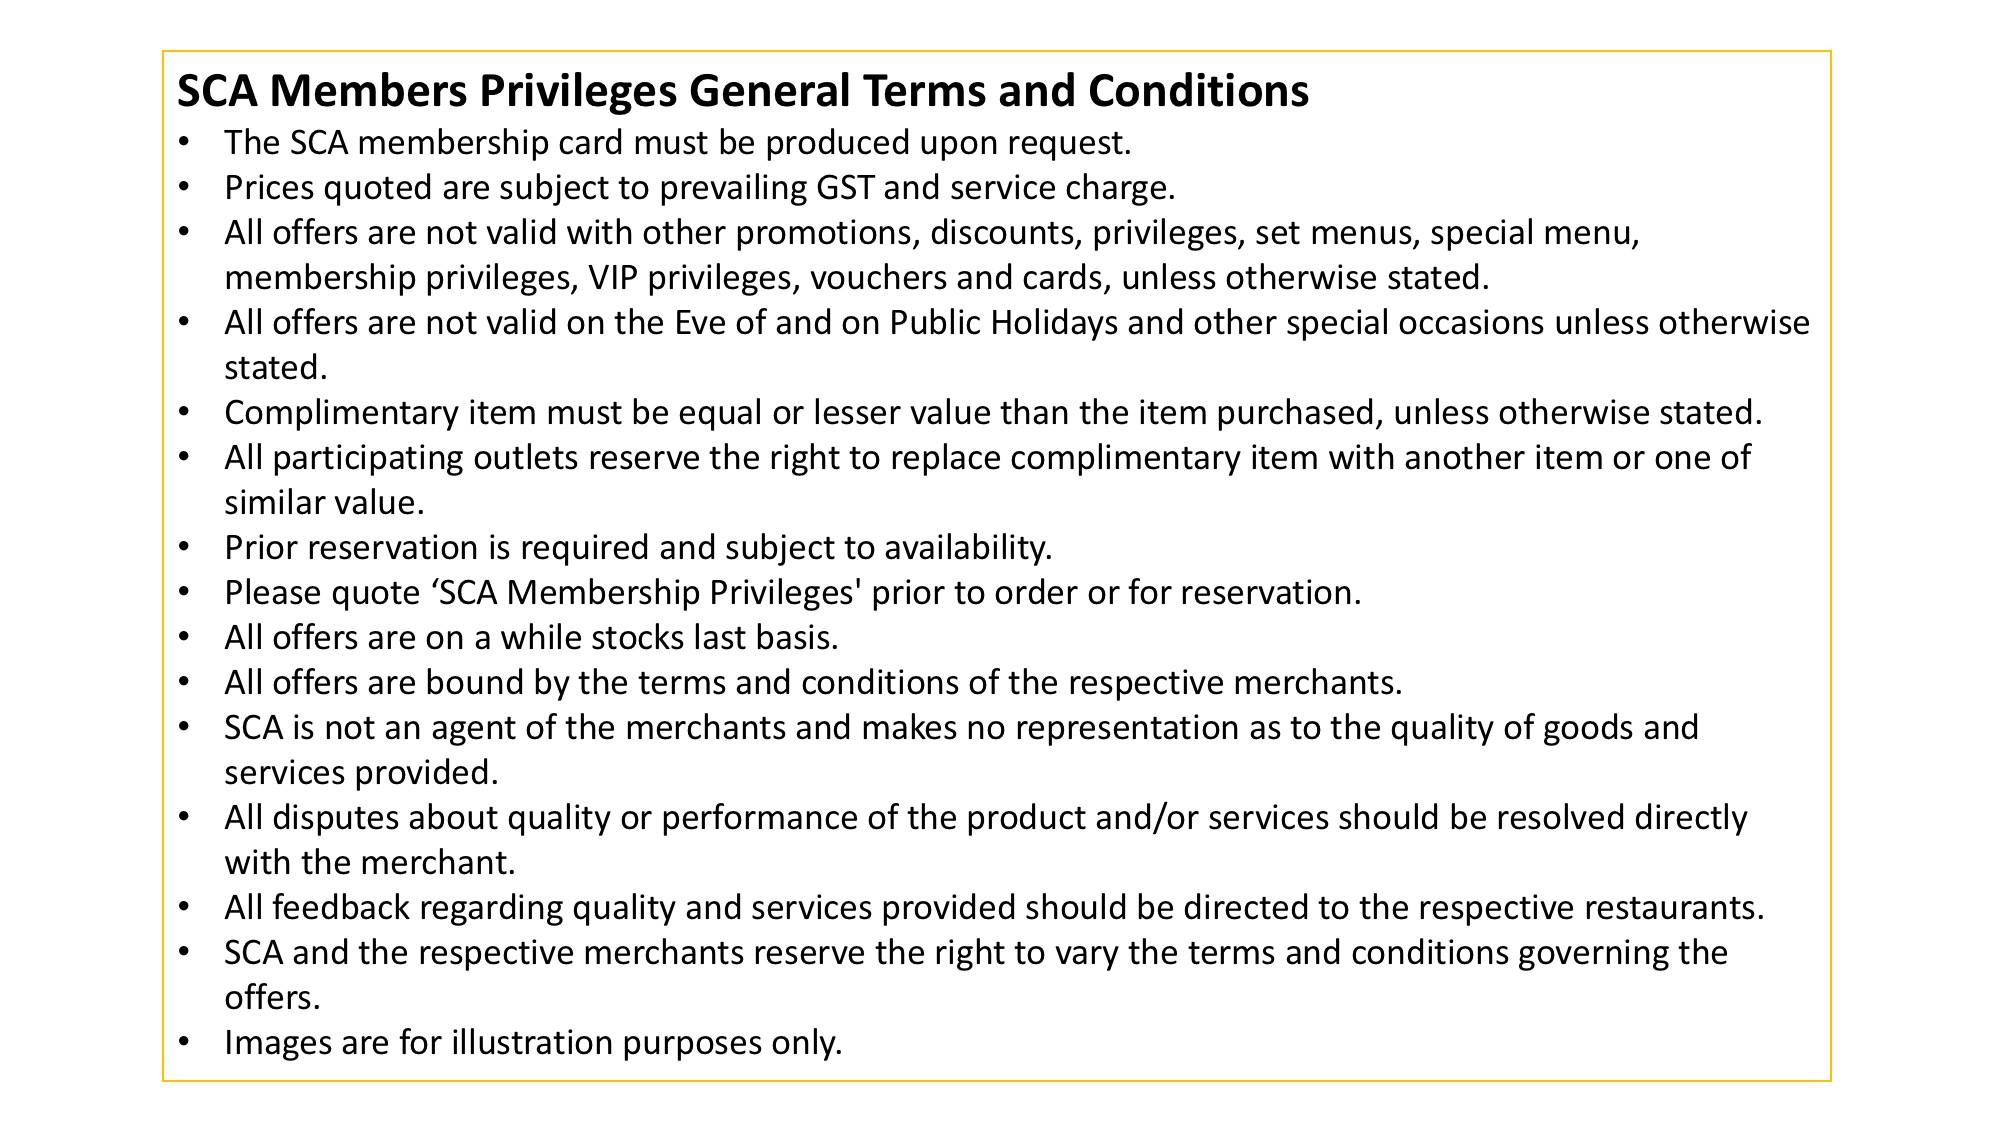 SCA Privileges General Terms & Condi